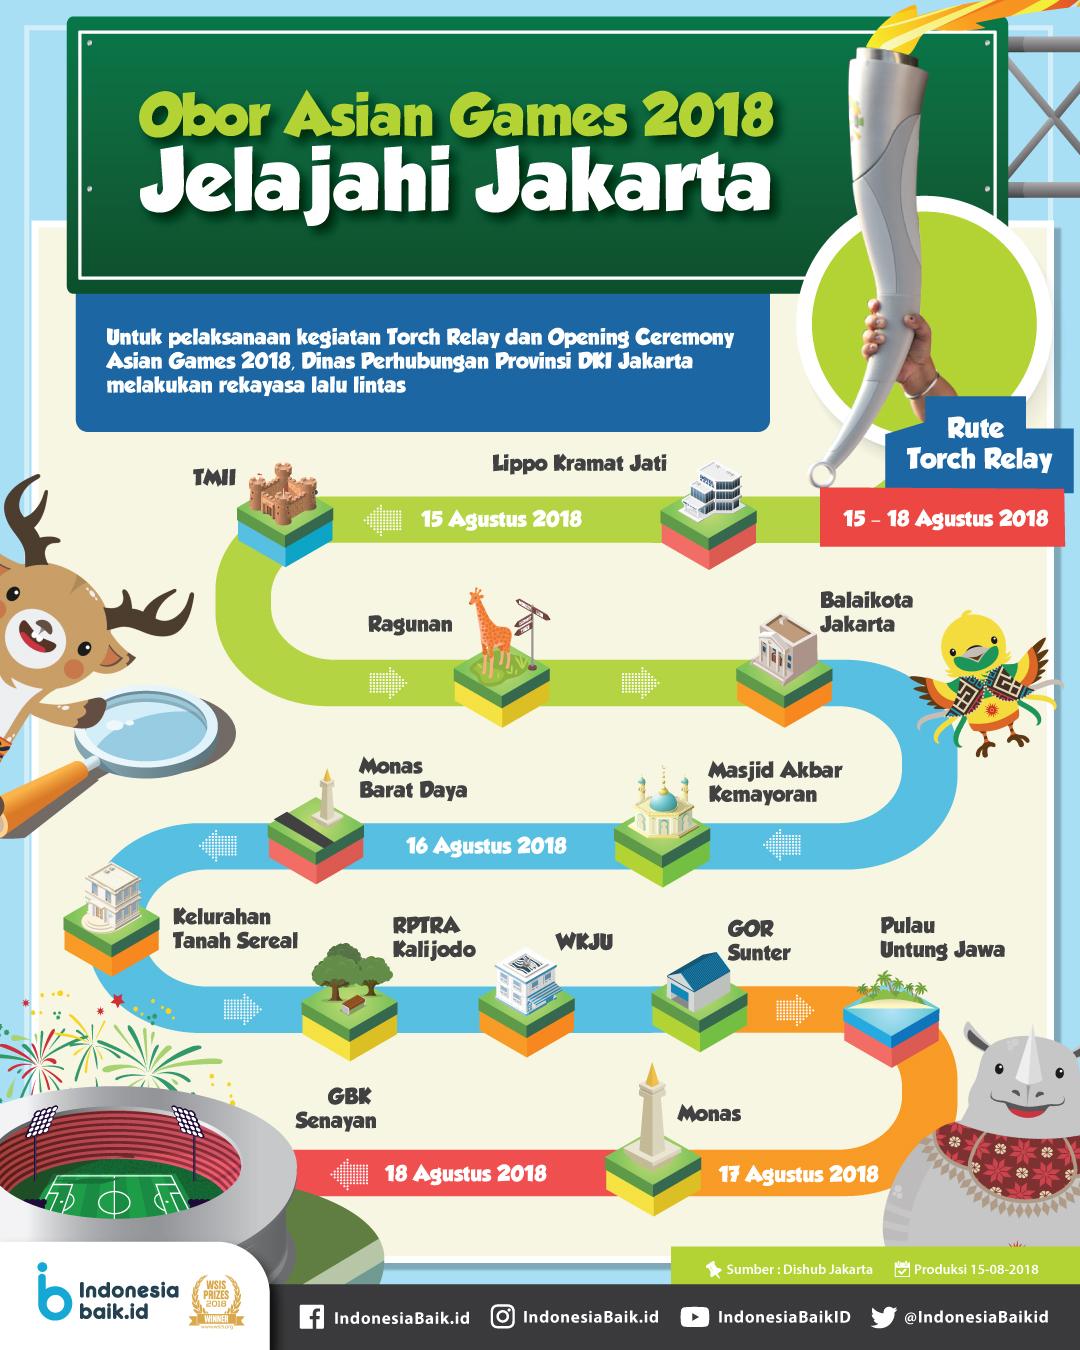 Obor Asian Games 2018 Jelajahi Jakarta